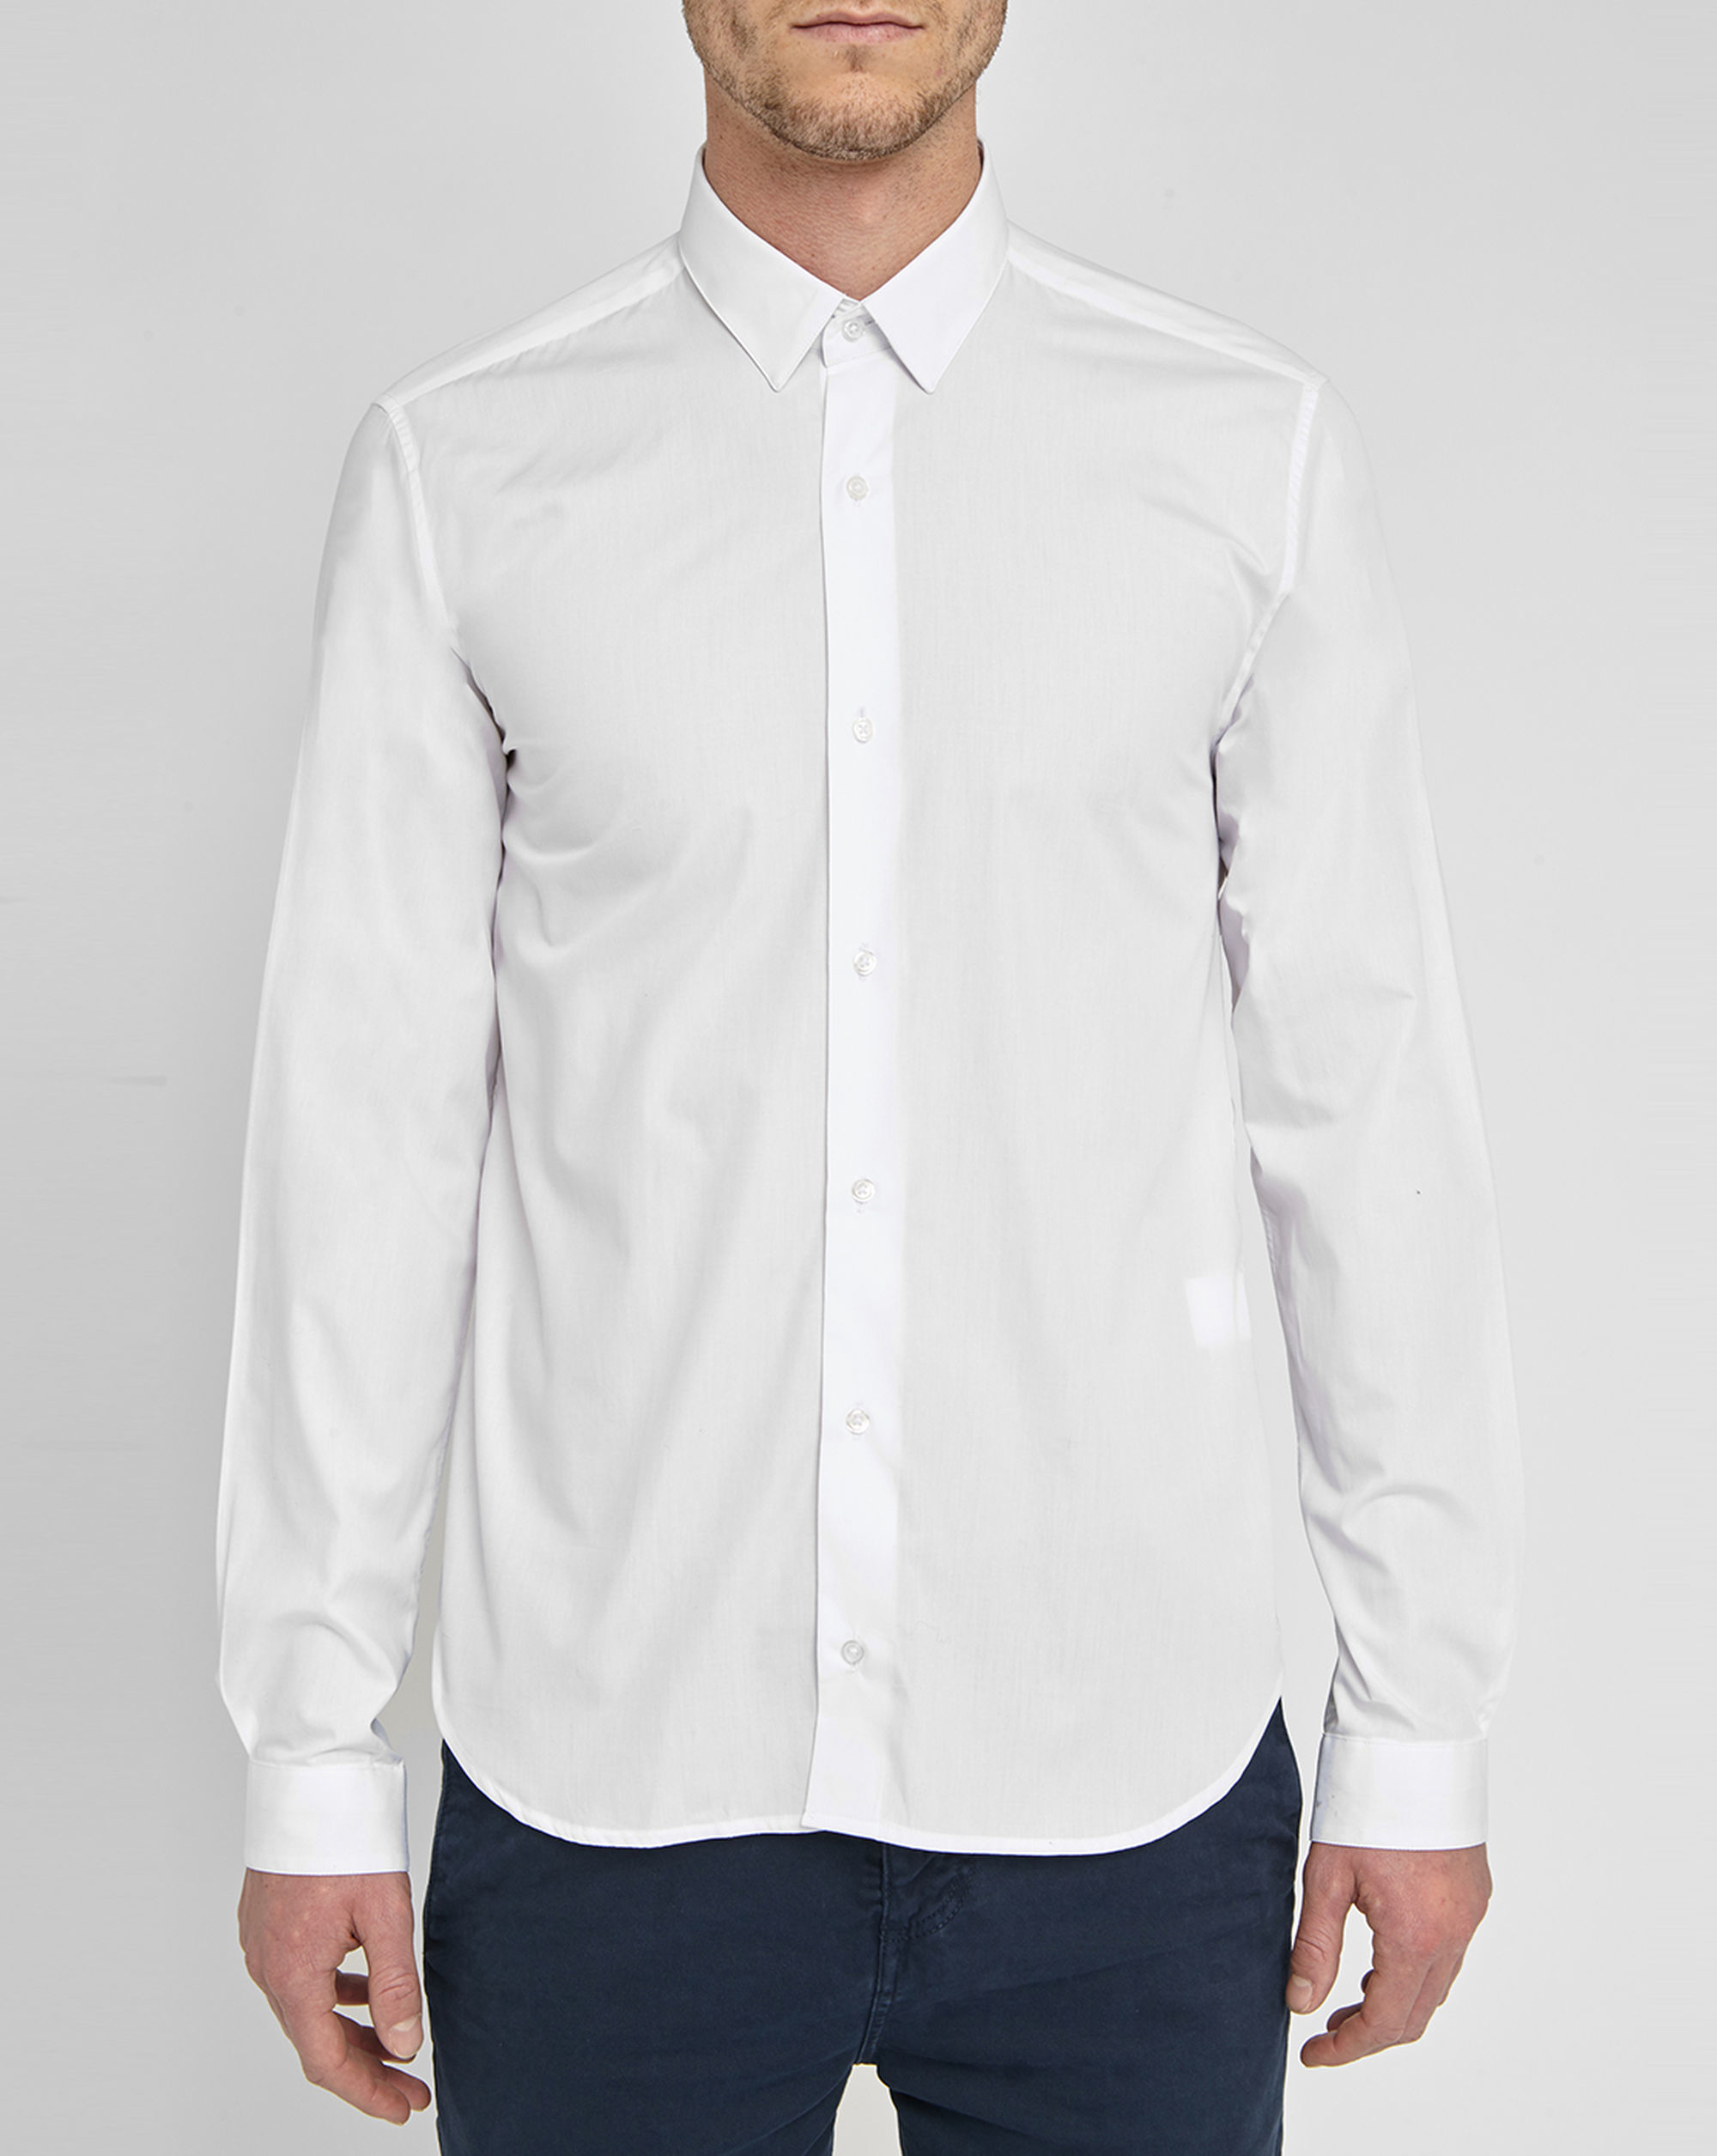 M.studio Noé White Poplin Cotton Shirt Fitted-cut Small ...